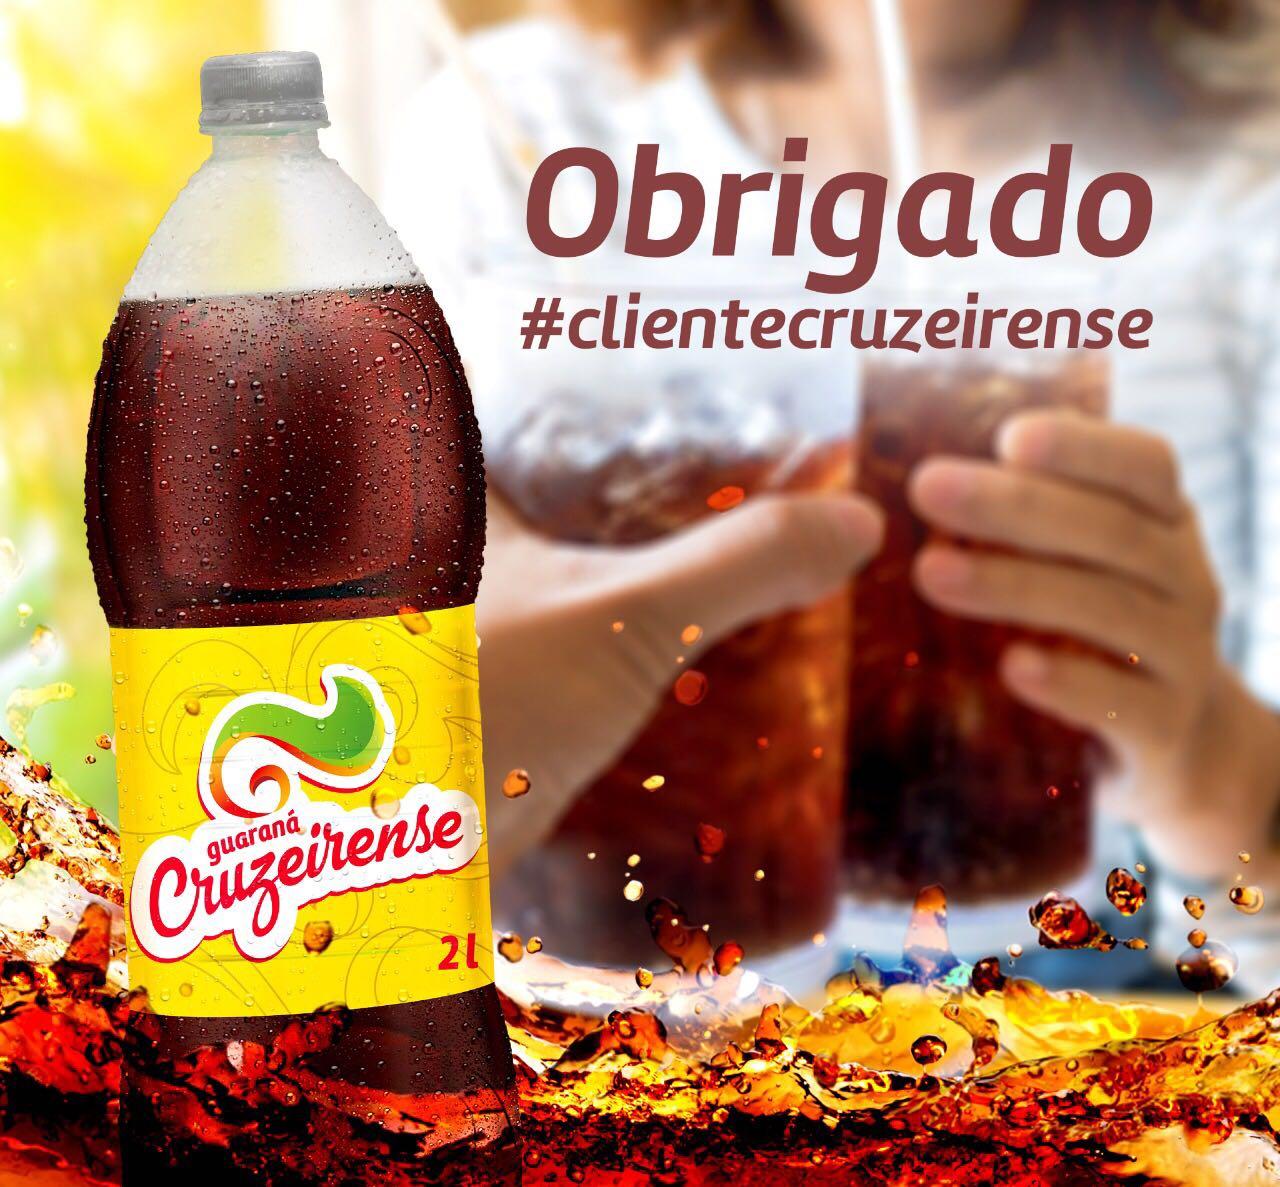 Bebidas Cruzeiro